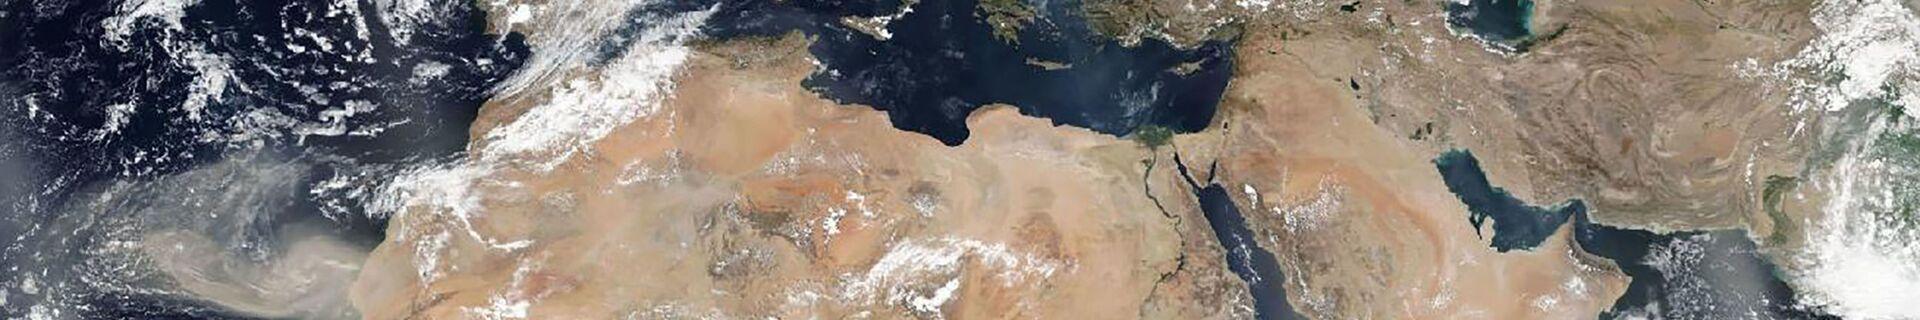 Les images satellites des feux de forêt en Afrique - Sputnik France, 1920, 22.09.2021